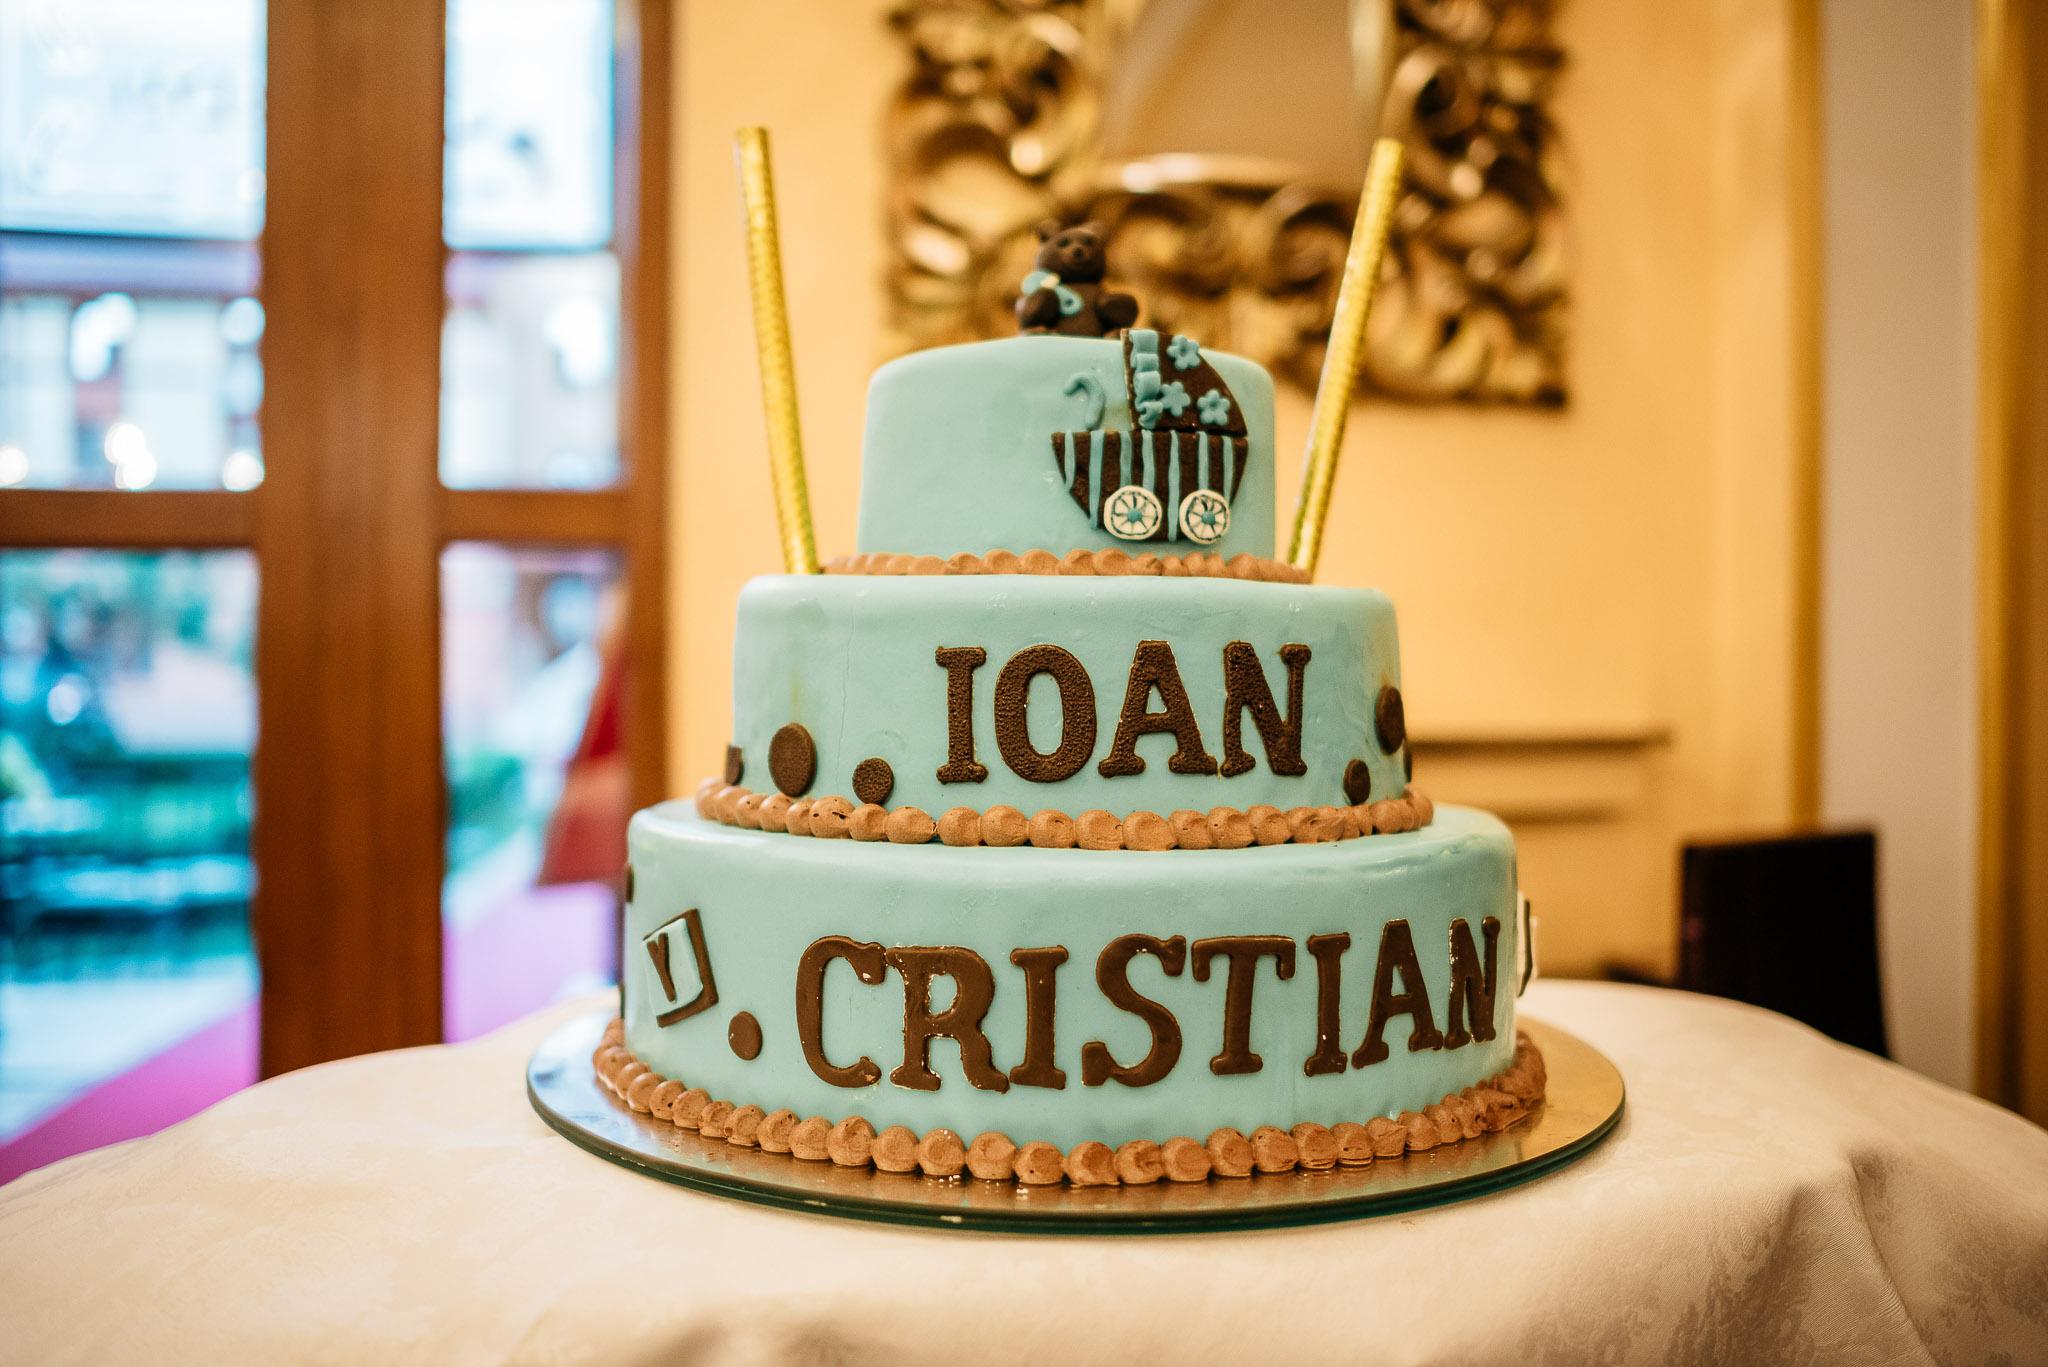 Botez Ioan Cristian (488)